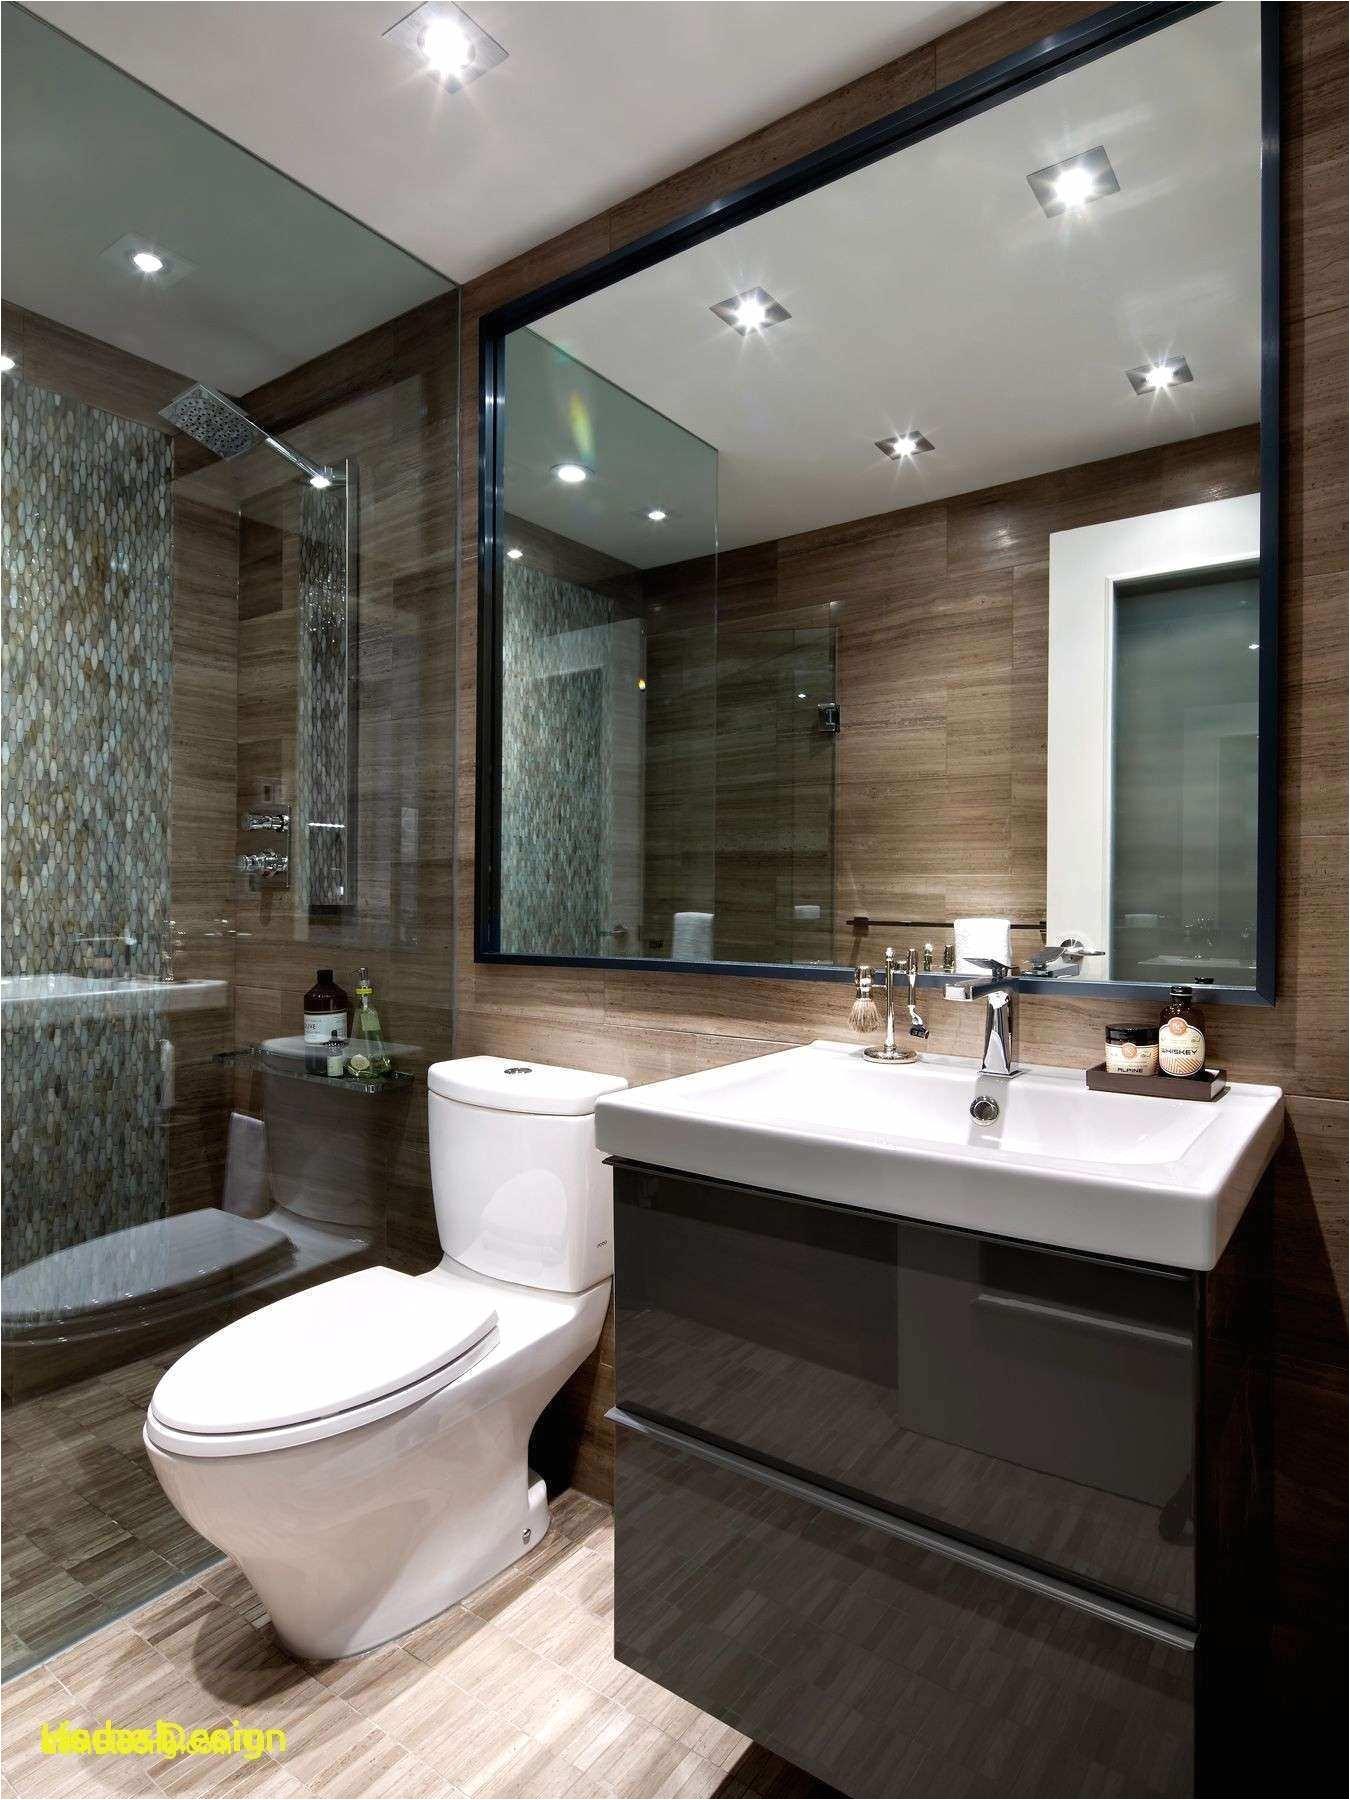 Bathroom Design Template Elegant New Bathroom Design 7x7